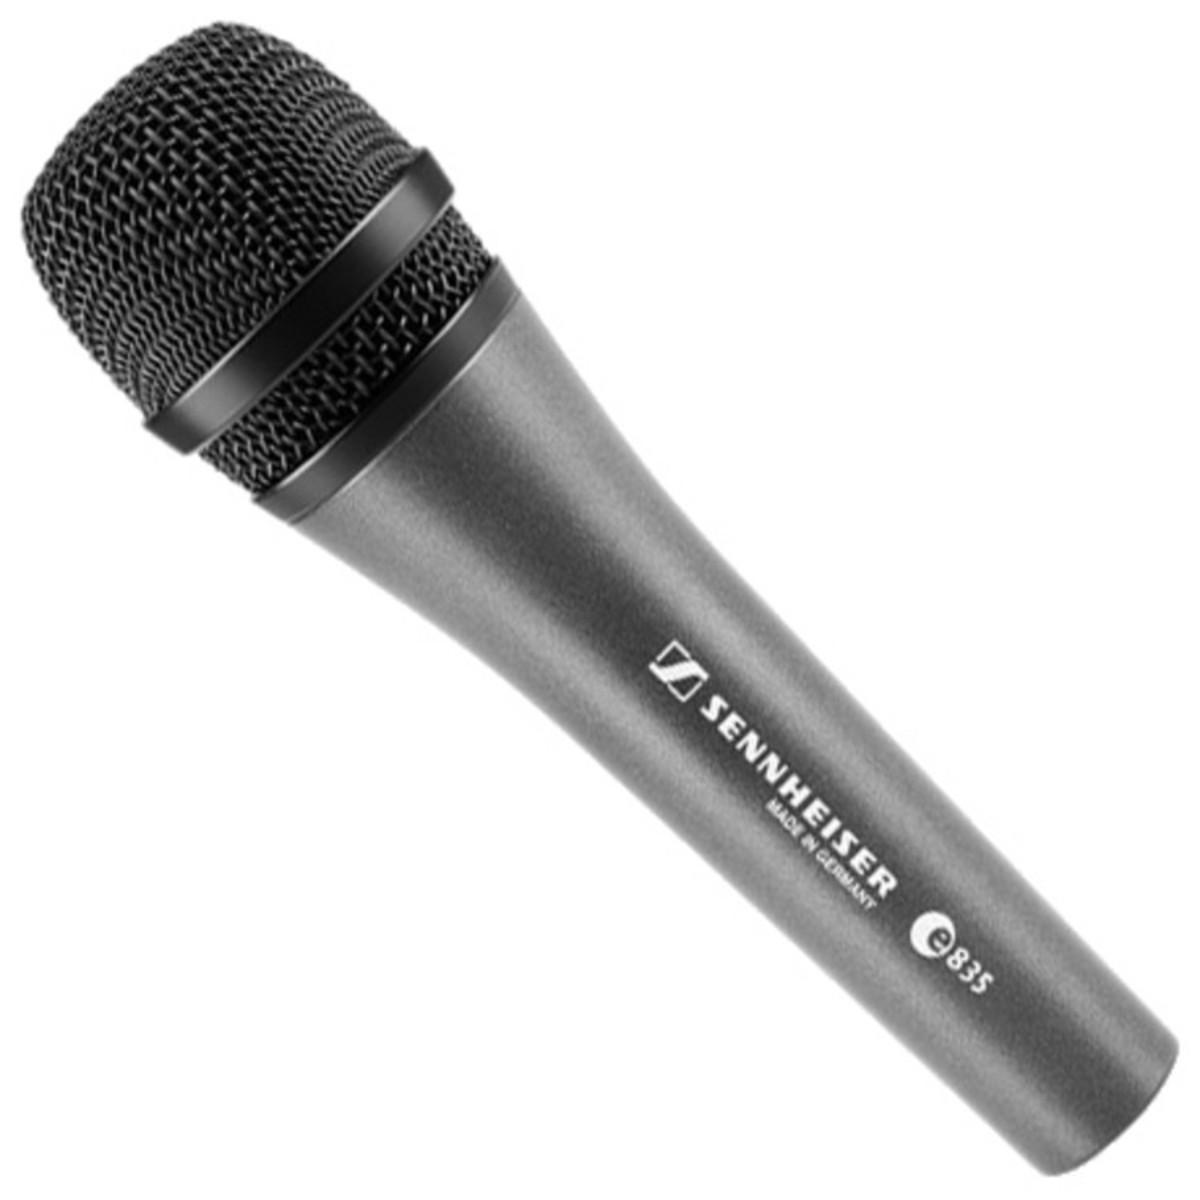 sennheiser e835 cardioid vocal mic box opened at. Black Bedroom Furniture Sets. Home Design Ideas